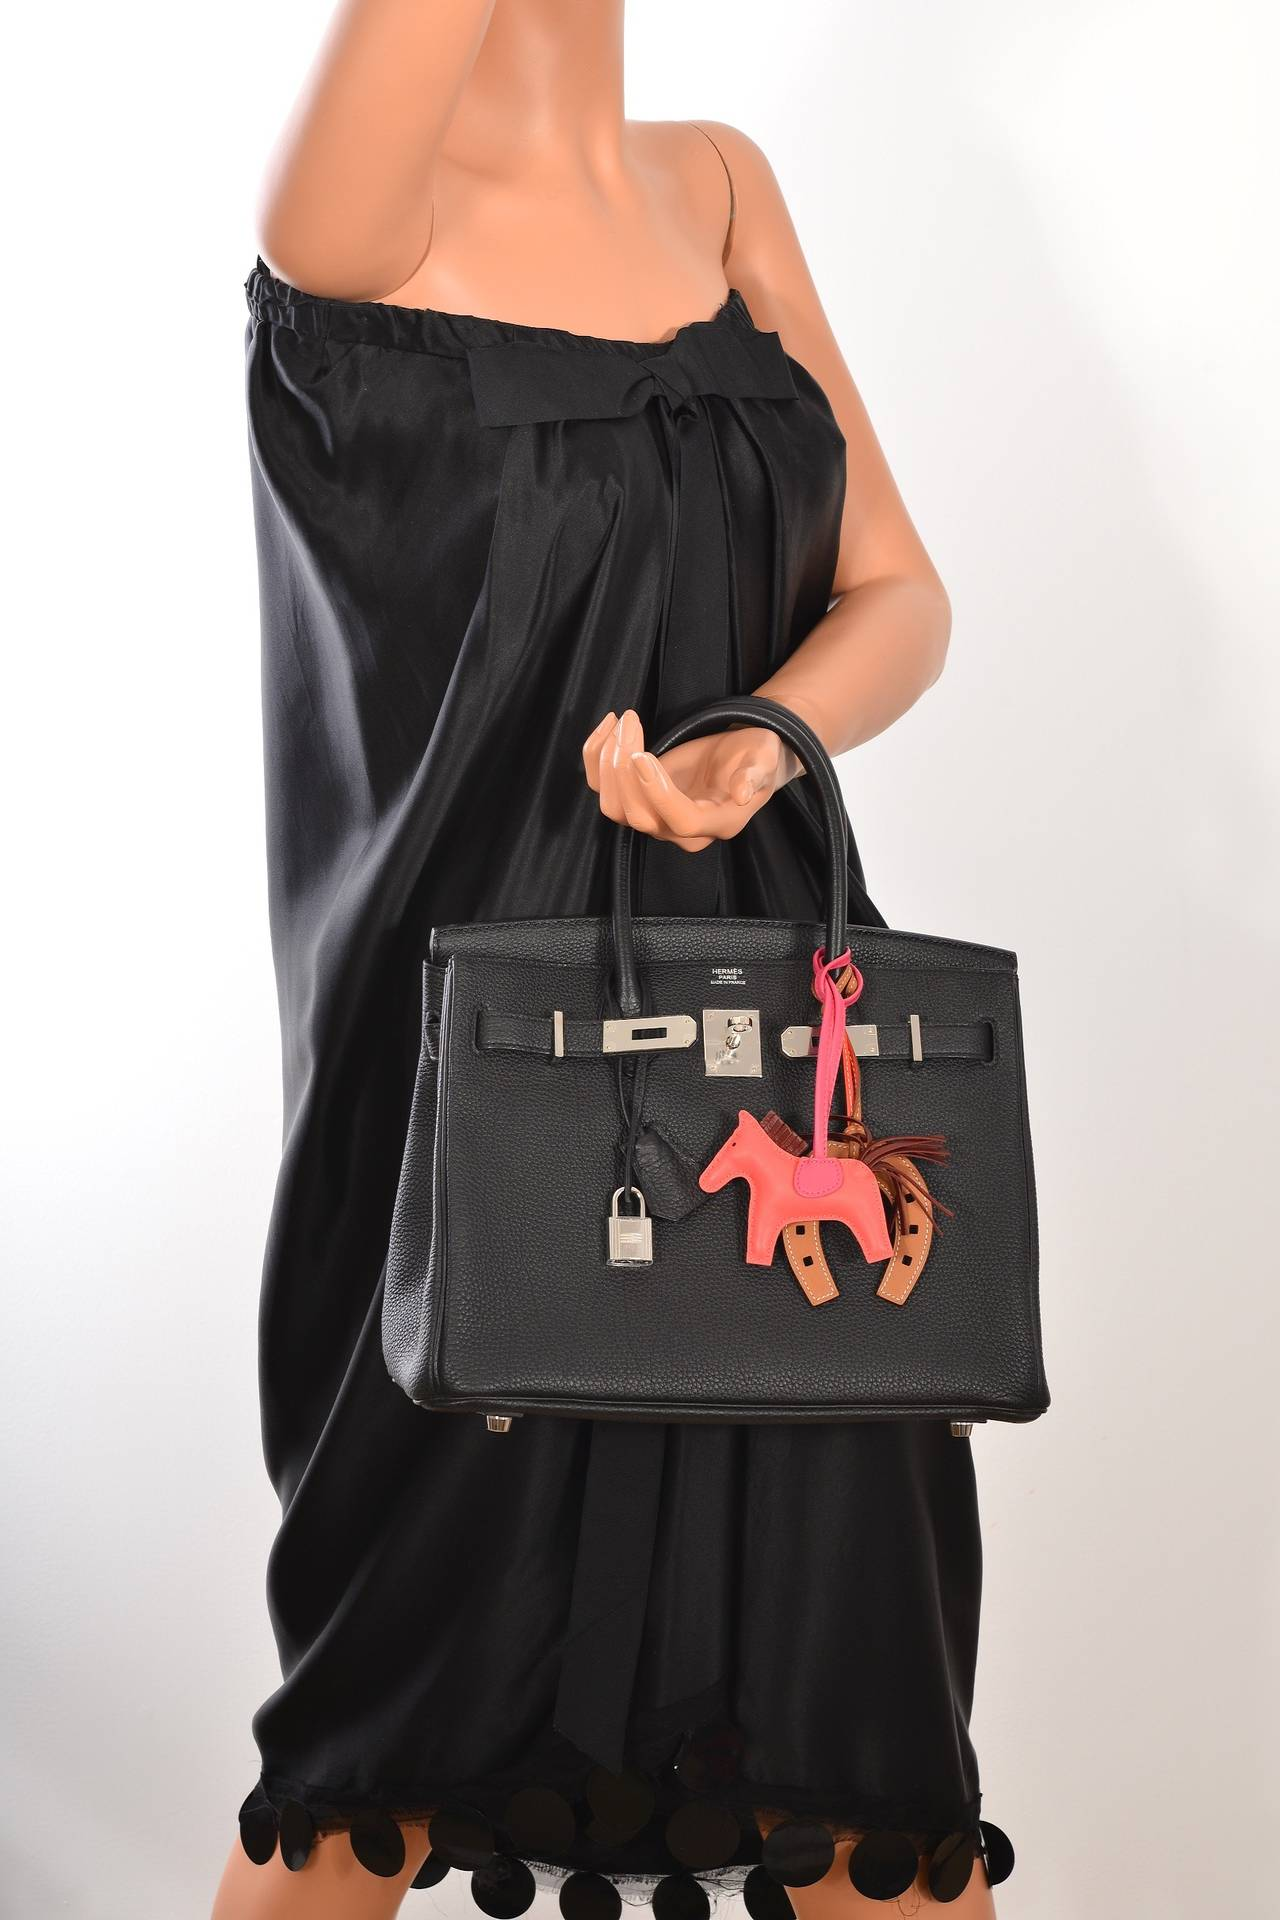 hermes replica bags for sale - HERMES KELLY BAG 28cm BLACK TOGO PALLADIUM HARDWARE JaneFinds at ...